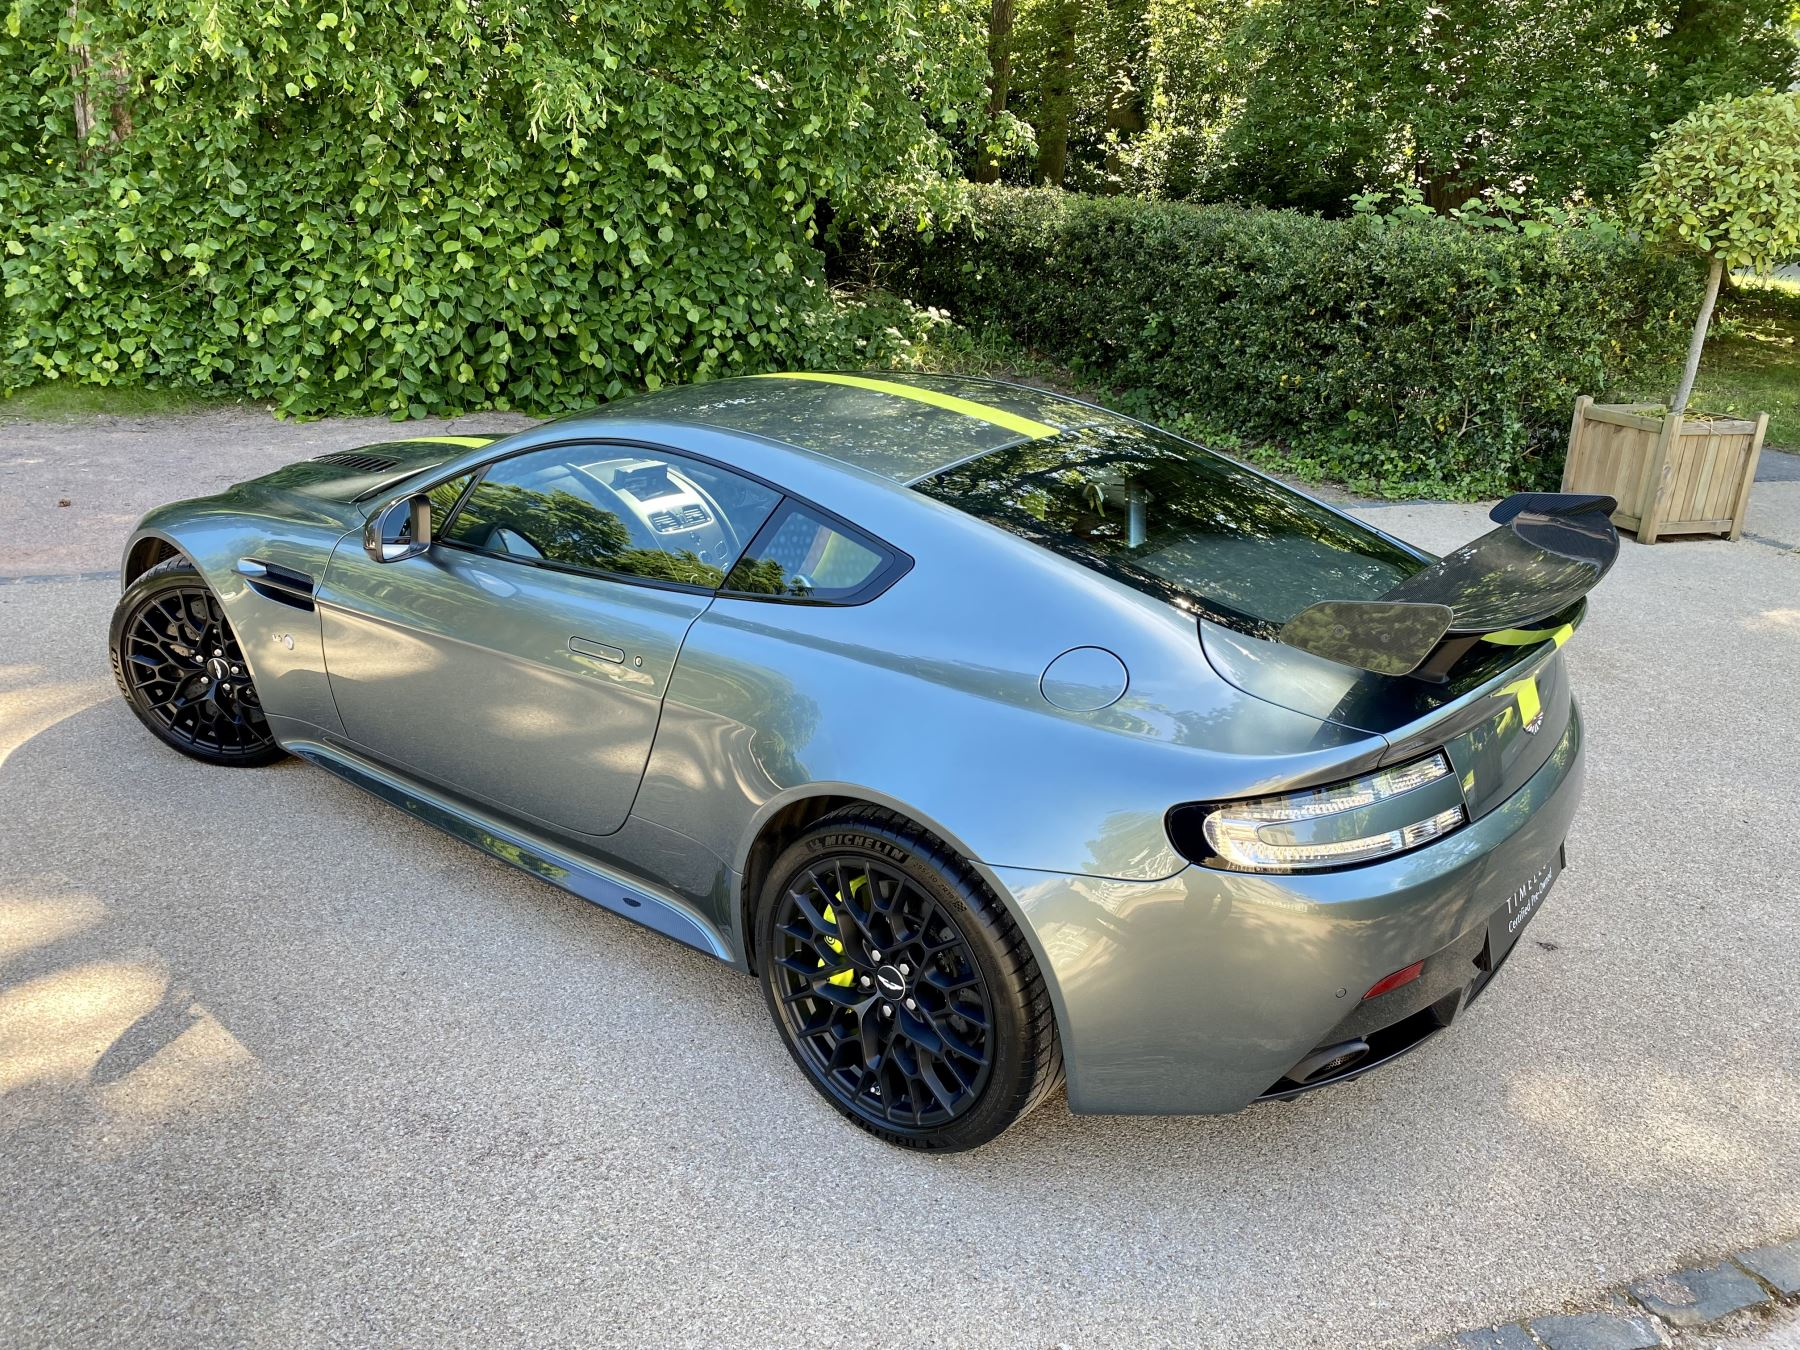 Aston Martin V12 Vantage AMR 6.0 V12 600BHP Manual 1 of 100.     1 Owner From New, Full Aston Martin History. image 10